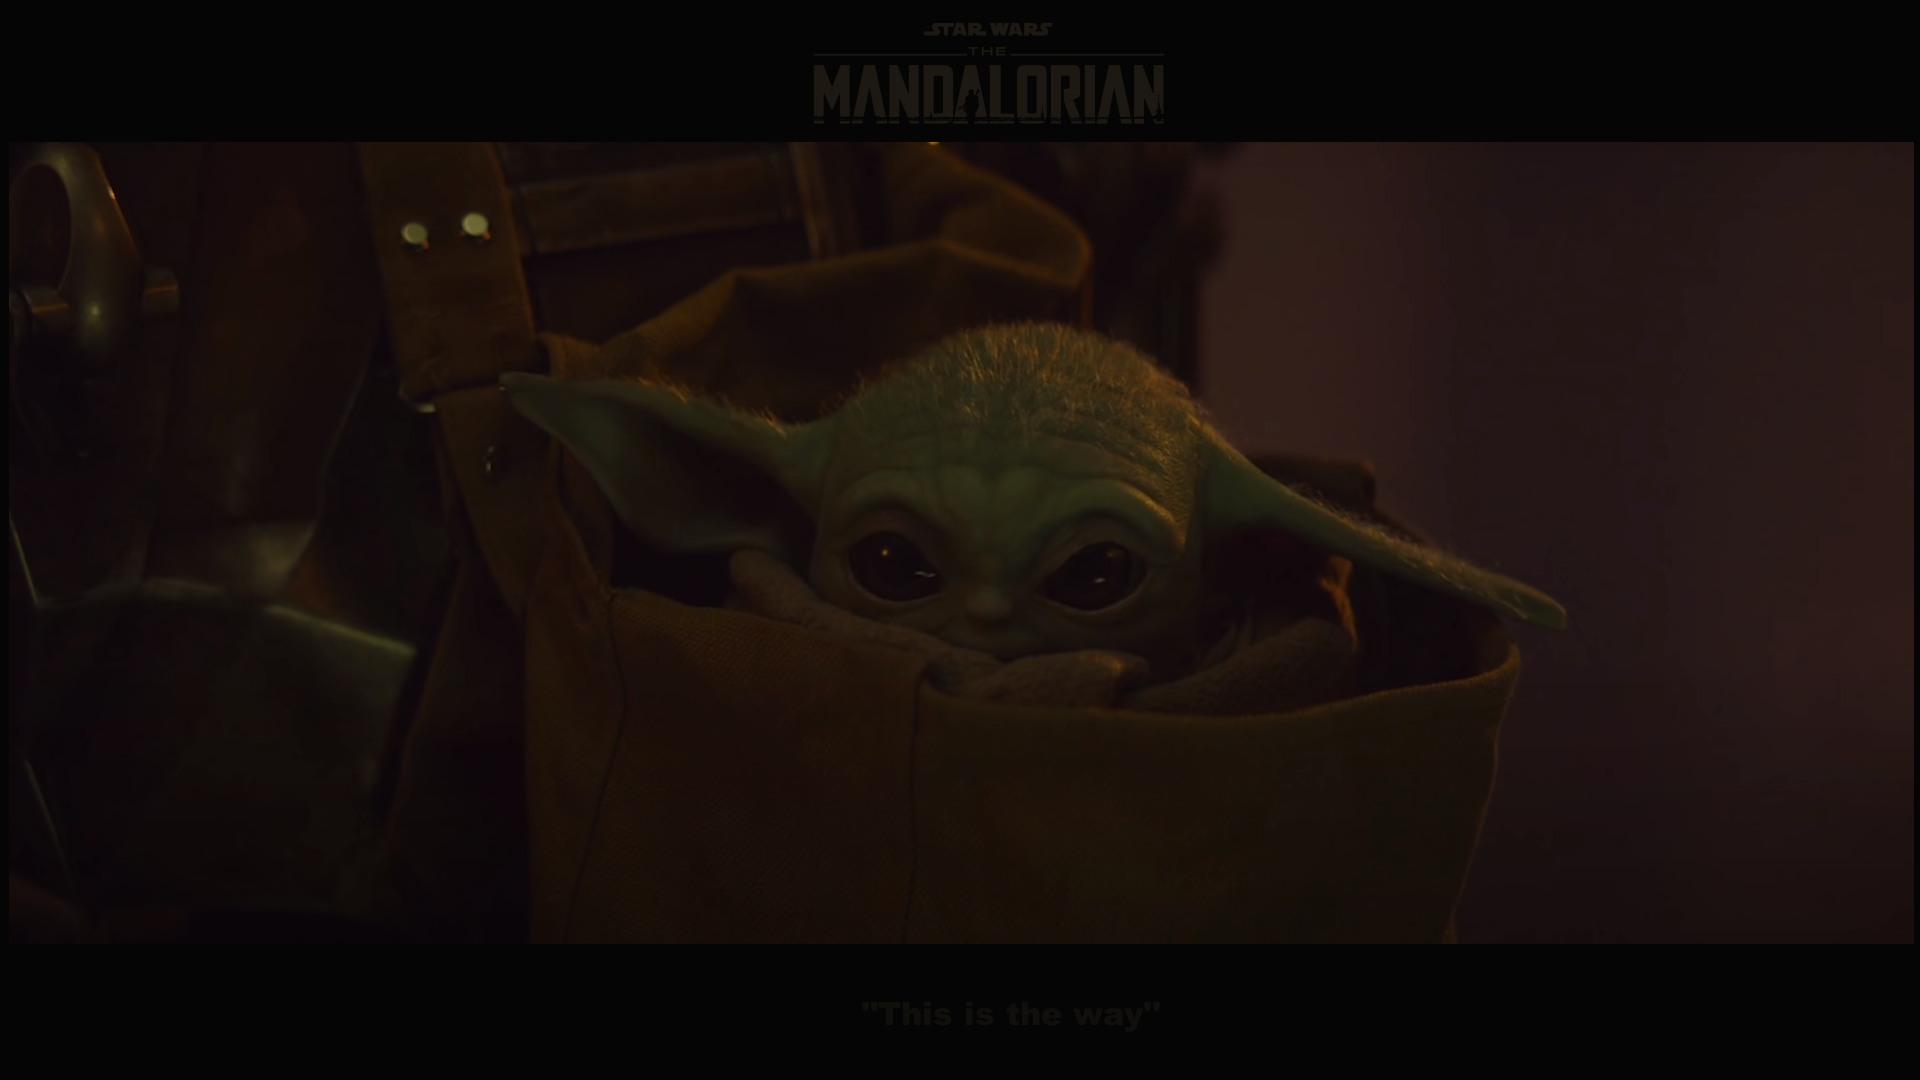 The Mandalorian Wallpaper - Star Wars Poster - Mandalorian Background